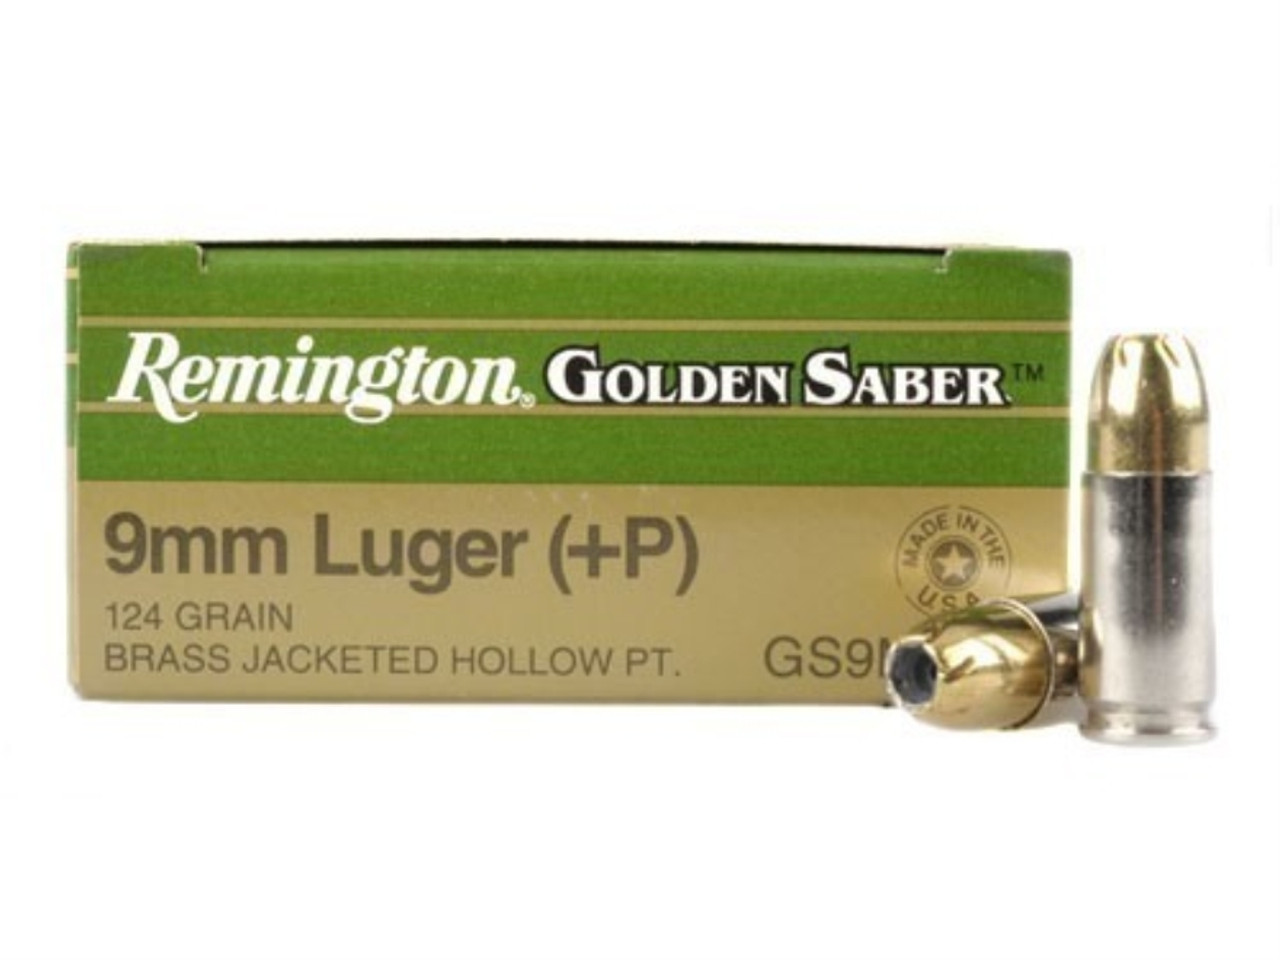 REMINGTON GOLDEN SABER 9MM +P 124 GRAIN BRASS JACKETED HOLLOW POINT 25  ROUND/ BOX AMMO